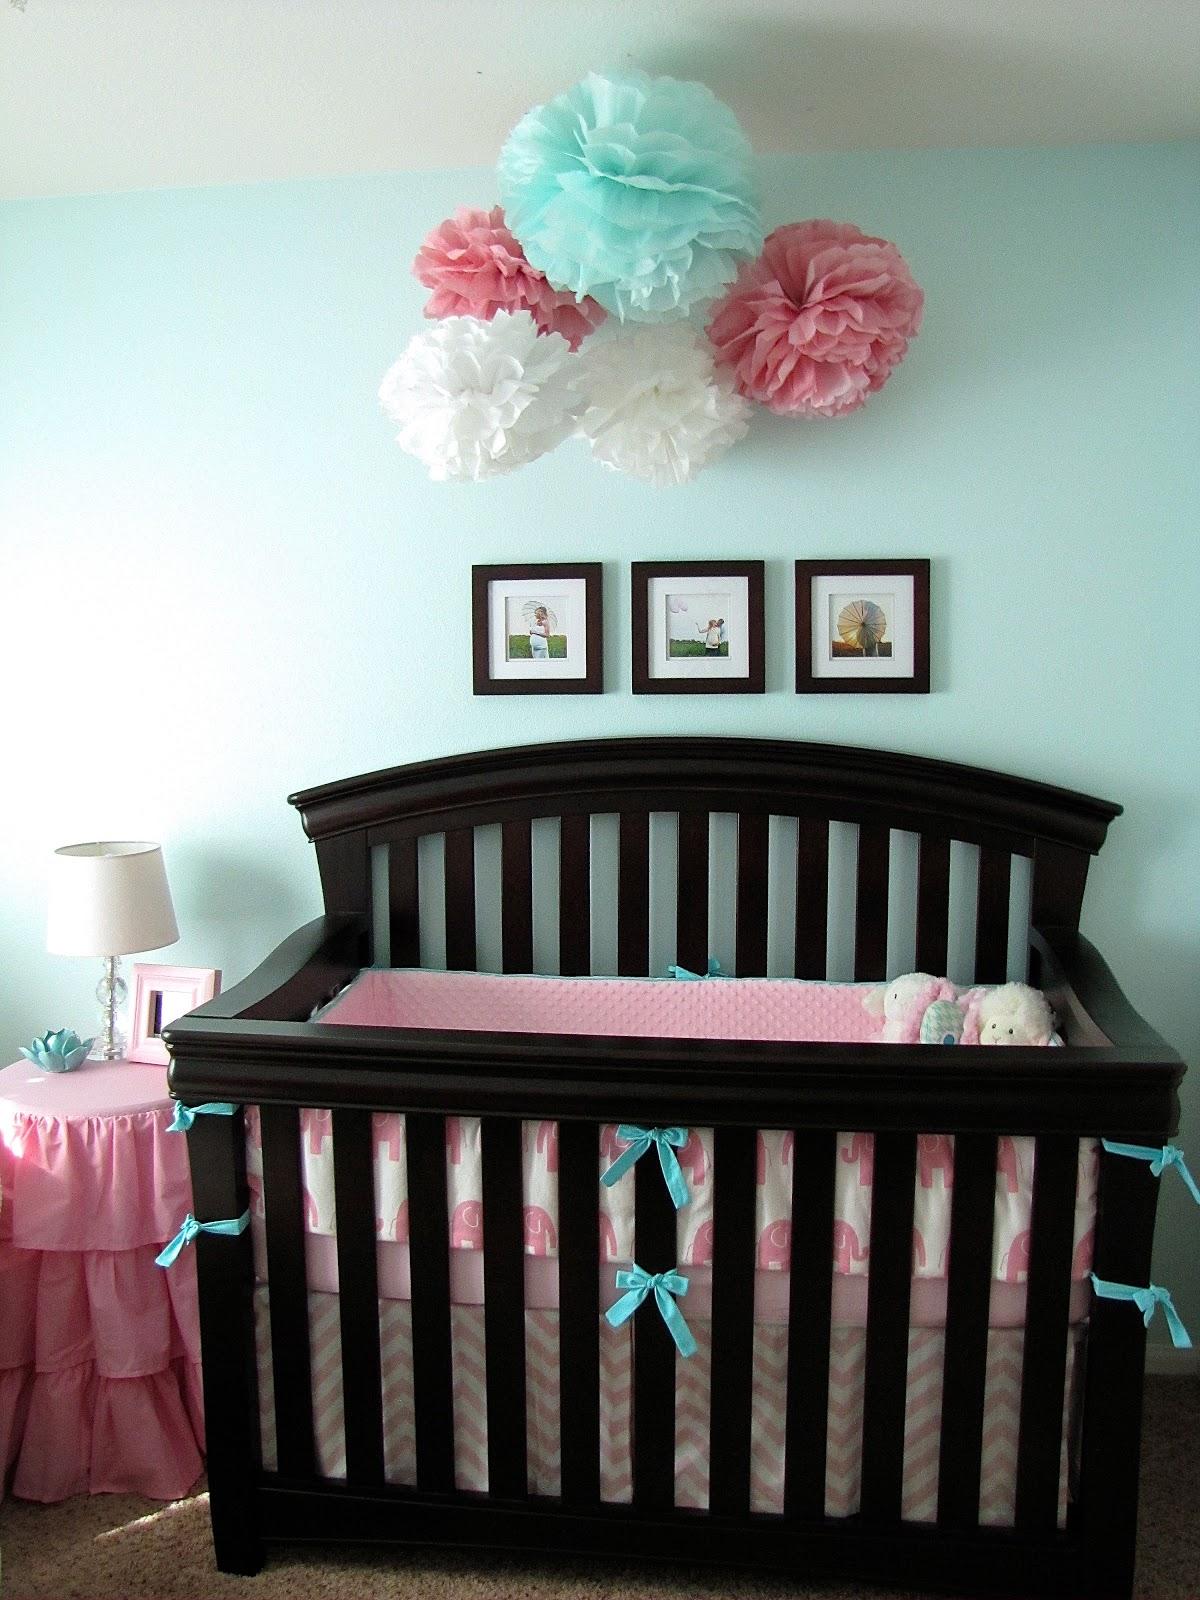 Eloise Adele's Pink and Aqua Nursery - Project Nursery  |Pink And Aqua Nursery